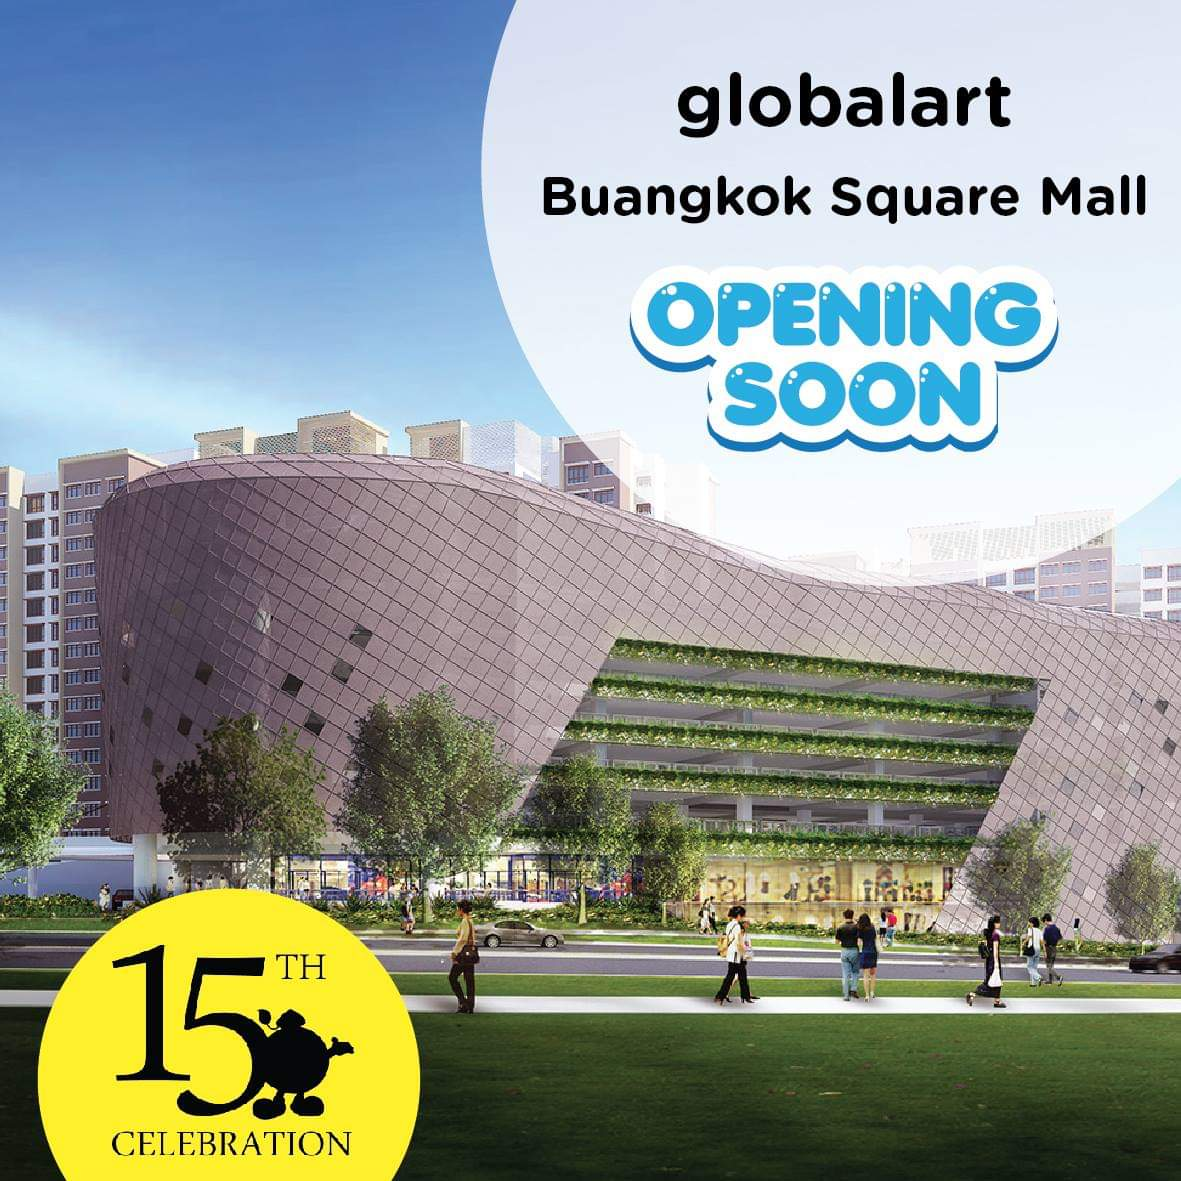 Globalart Buangkok Square Mall *Opening Soon*